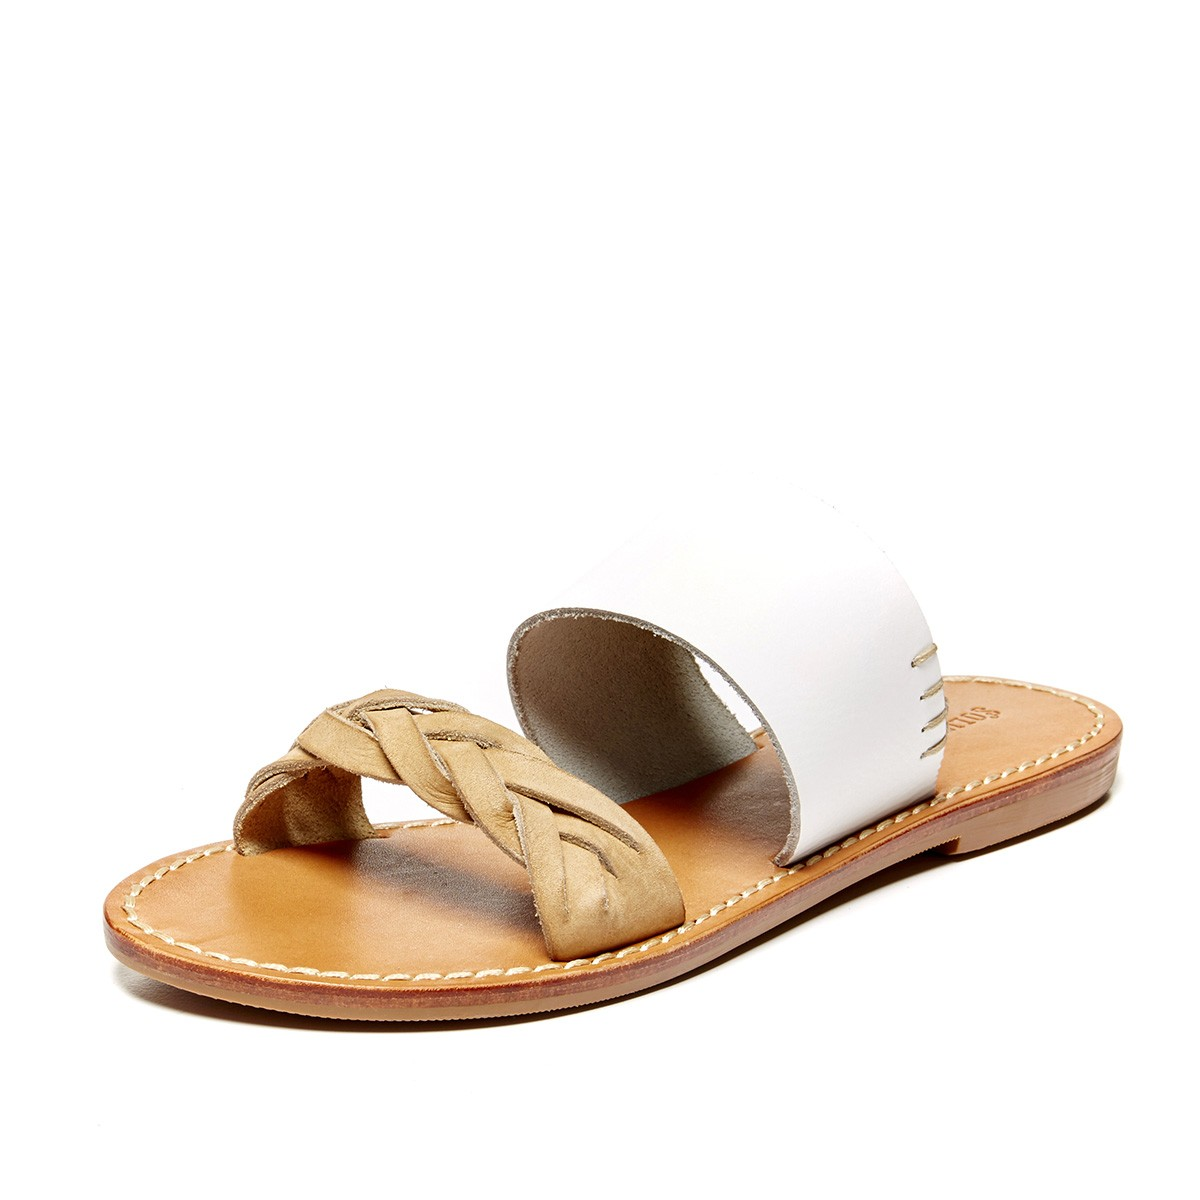 921ebacf908d Soludos White Braided Slide Sandal - Soludos Espadrilles